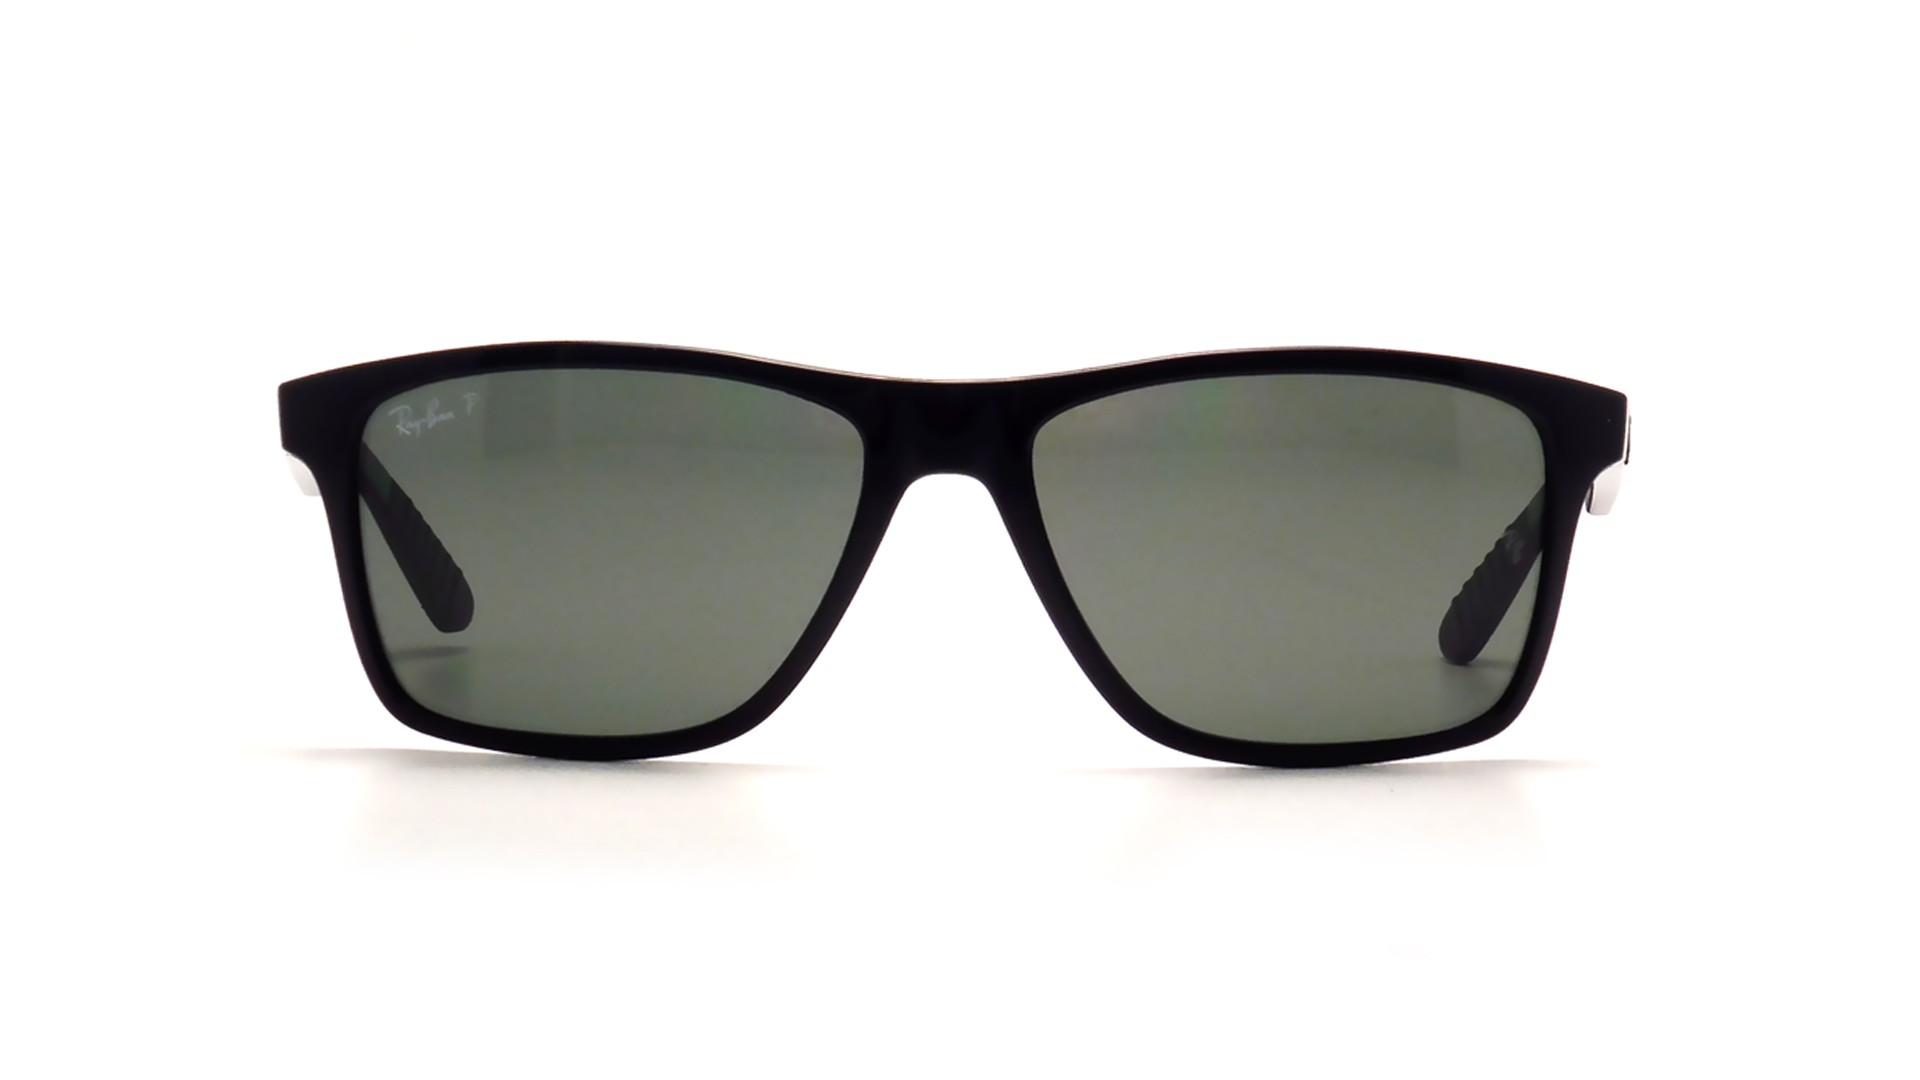 5398425e89e Sunglasses Ray-Ban Active Lifestyle Black RB4234 601 9A 58-16 Large  Polarized